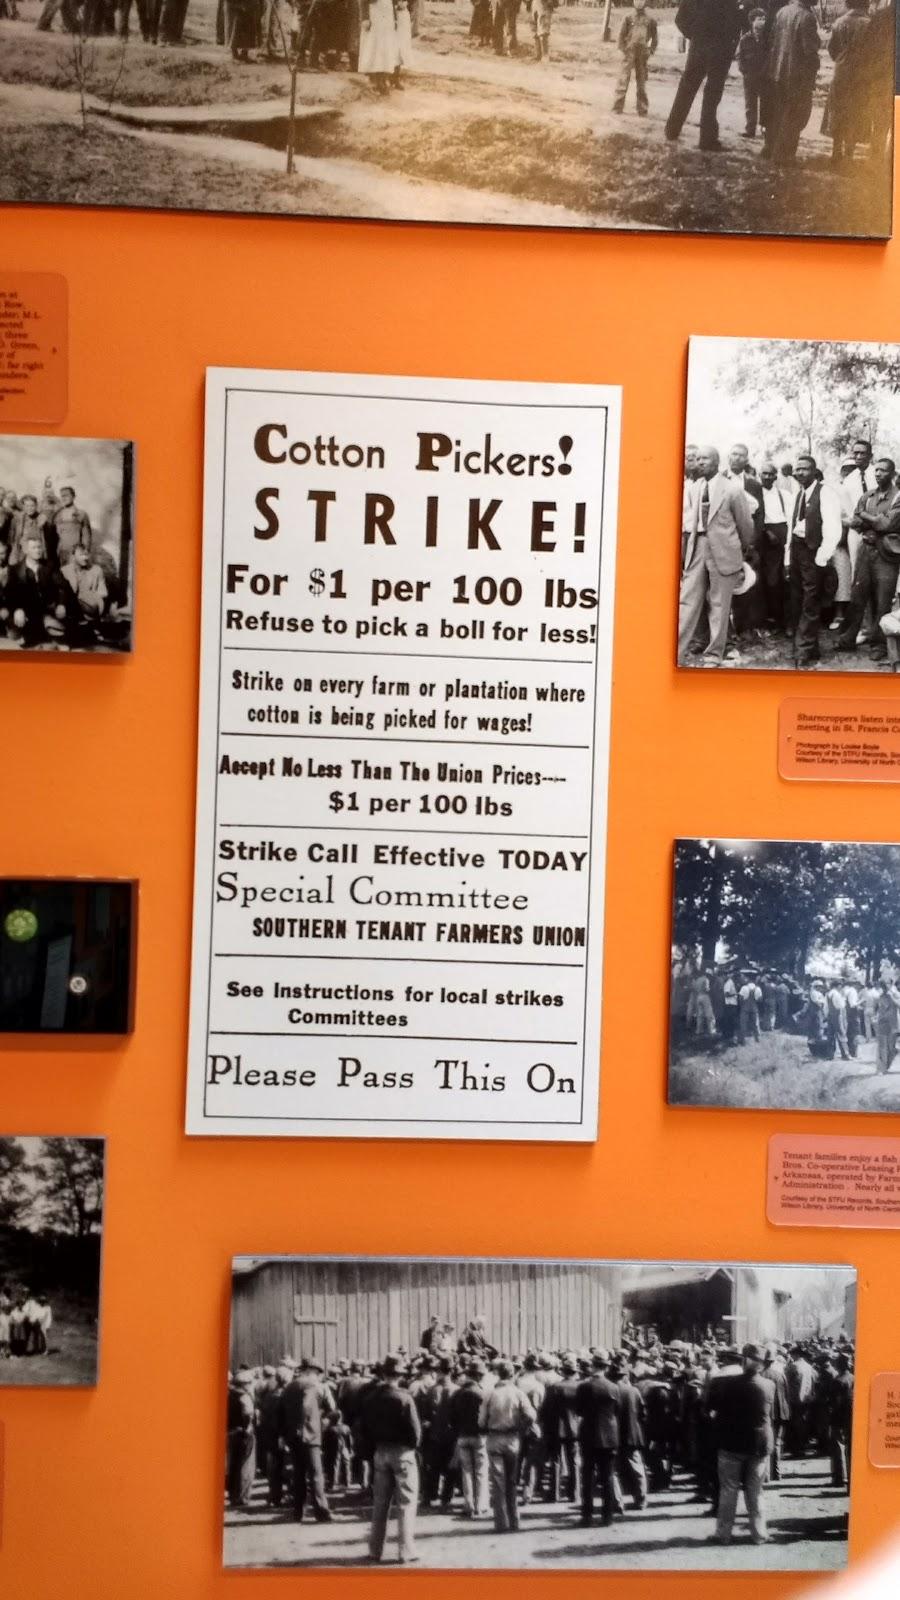 Southern Tenant Farmers Museum - museum  | Photo 10 of 10 | Address: 117 N Main St, Tyronza, AR 72386, USA | Phone: (870) 487-2909